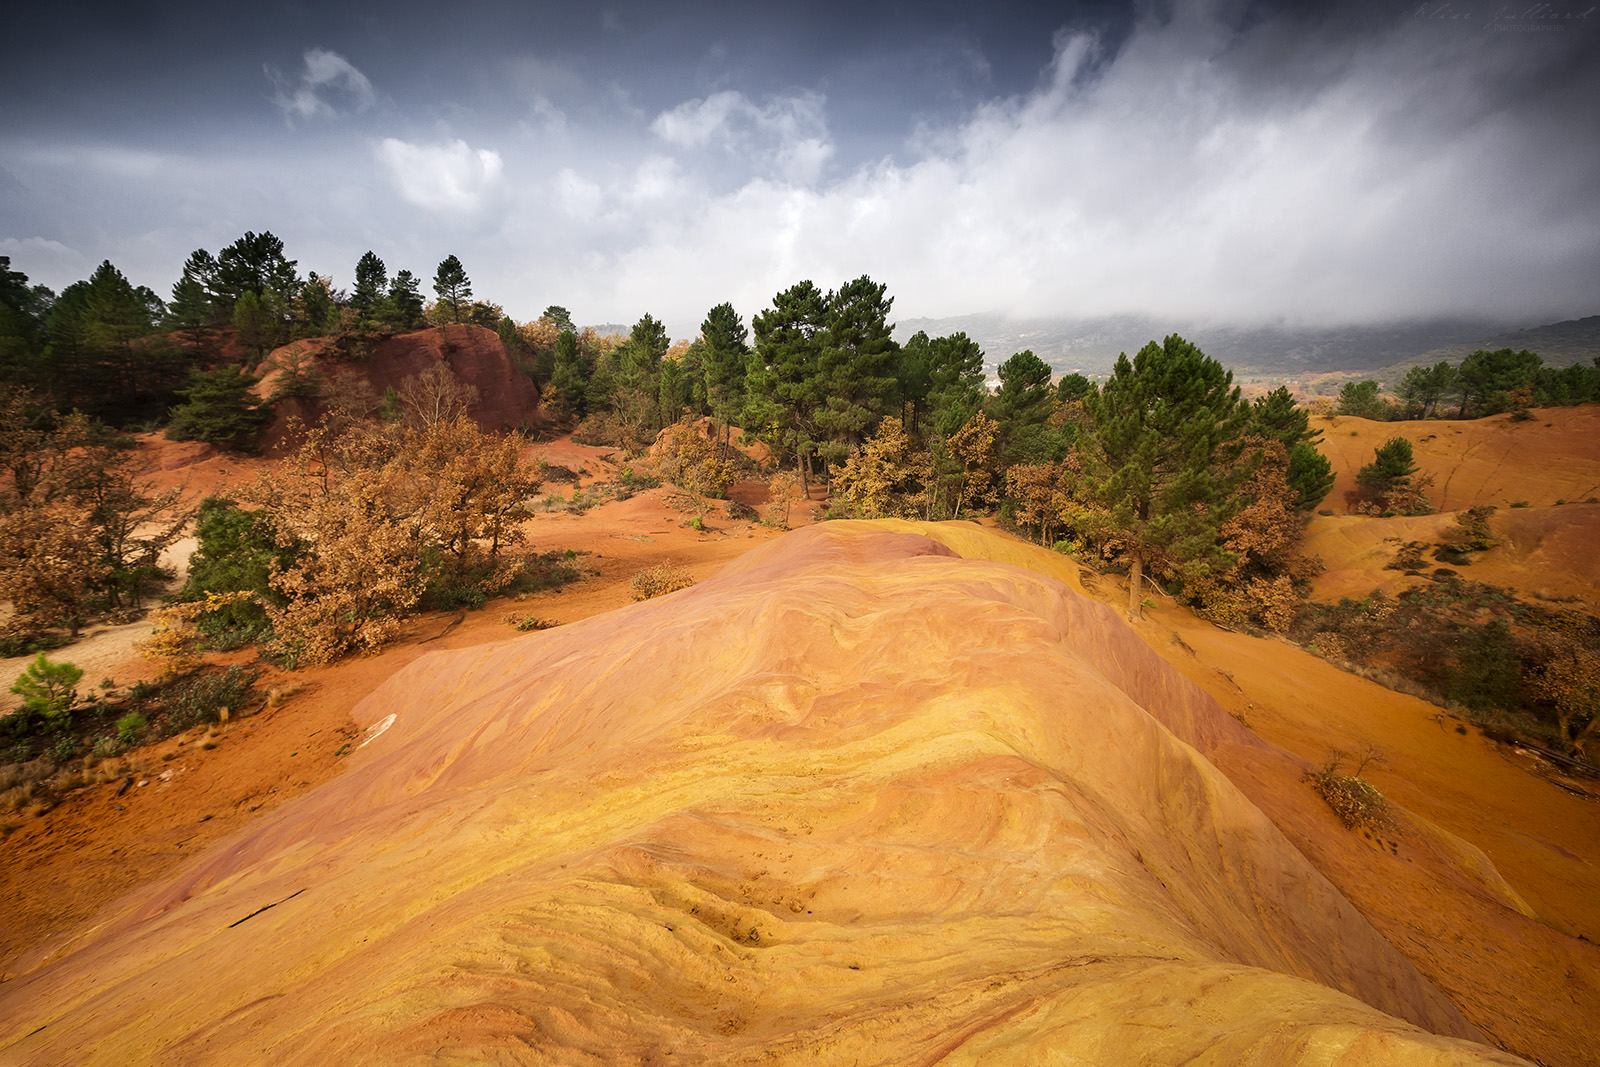 colorado-provencal-rustrel-vaucluse-parc-naturel-regional-luberon-provence-alpes-cote-dazur-carriere-ocre-france-paysage-desert-photographe-elise-julliard-apt-paca-2